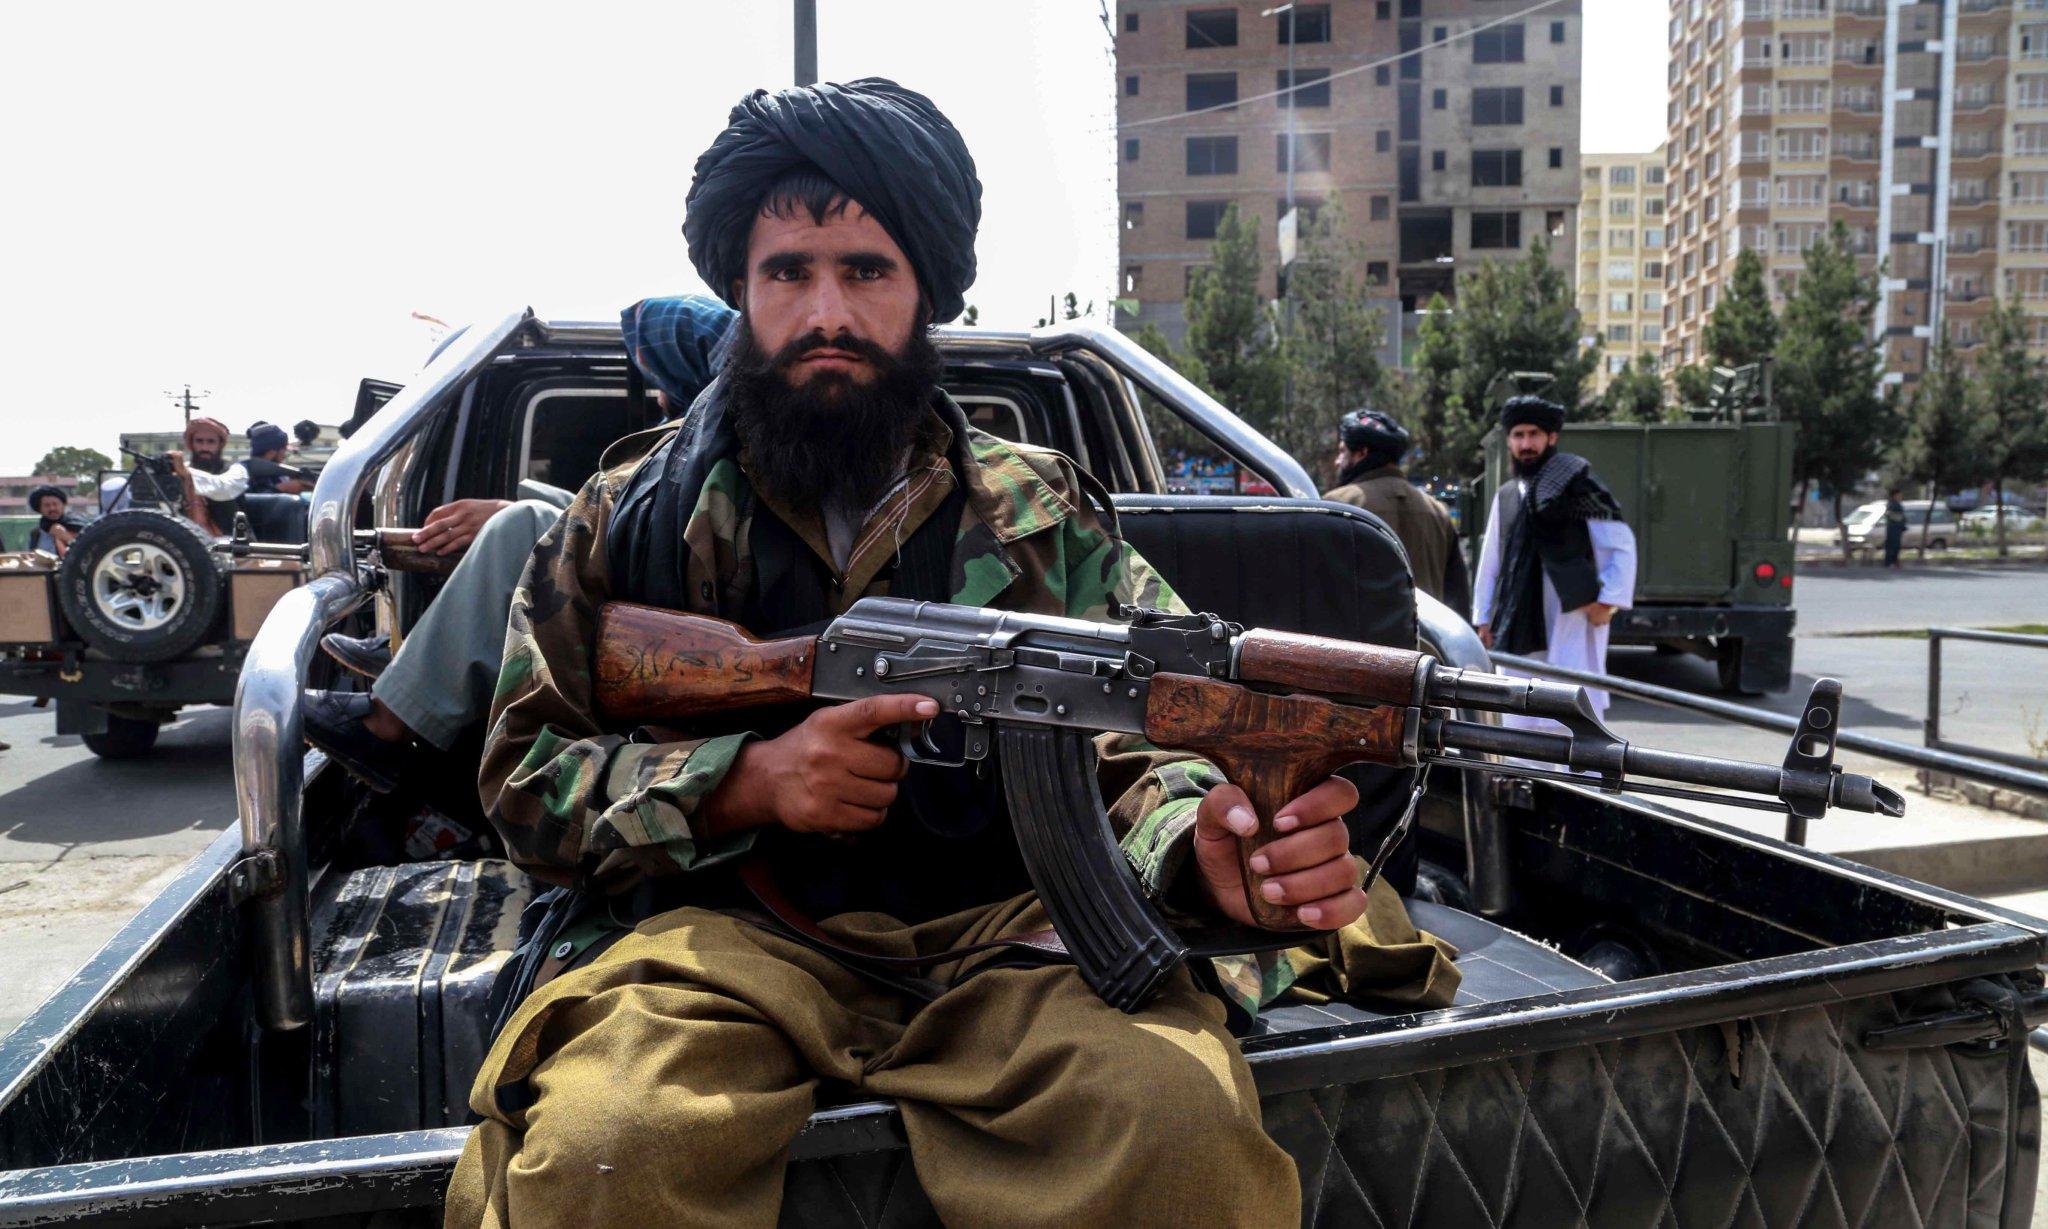 Afghanistan: Ashraf Ghani's exit scuttled Taliban power sharing chance – US envoy